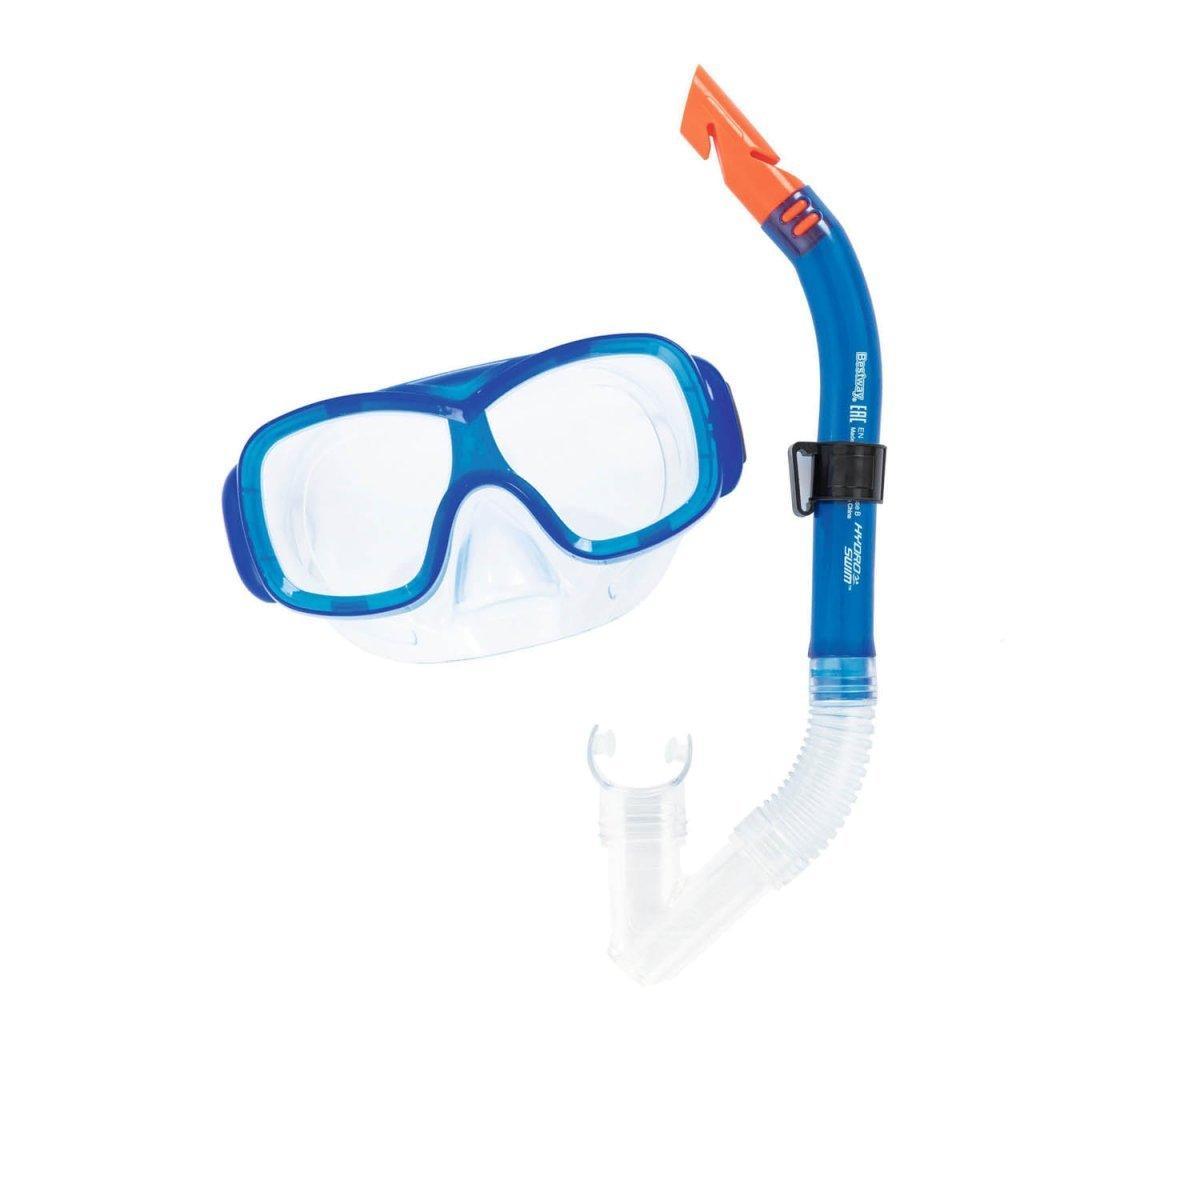 Набор 2 в 1 для плавания Bestway 24032 (маска: размер M, (6+), обхват головы ≈ 52 см, трубка), синий